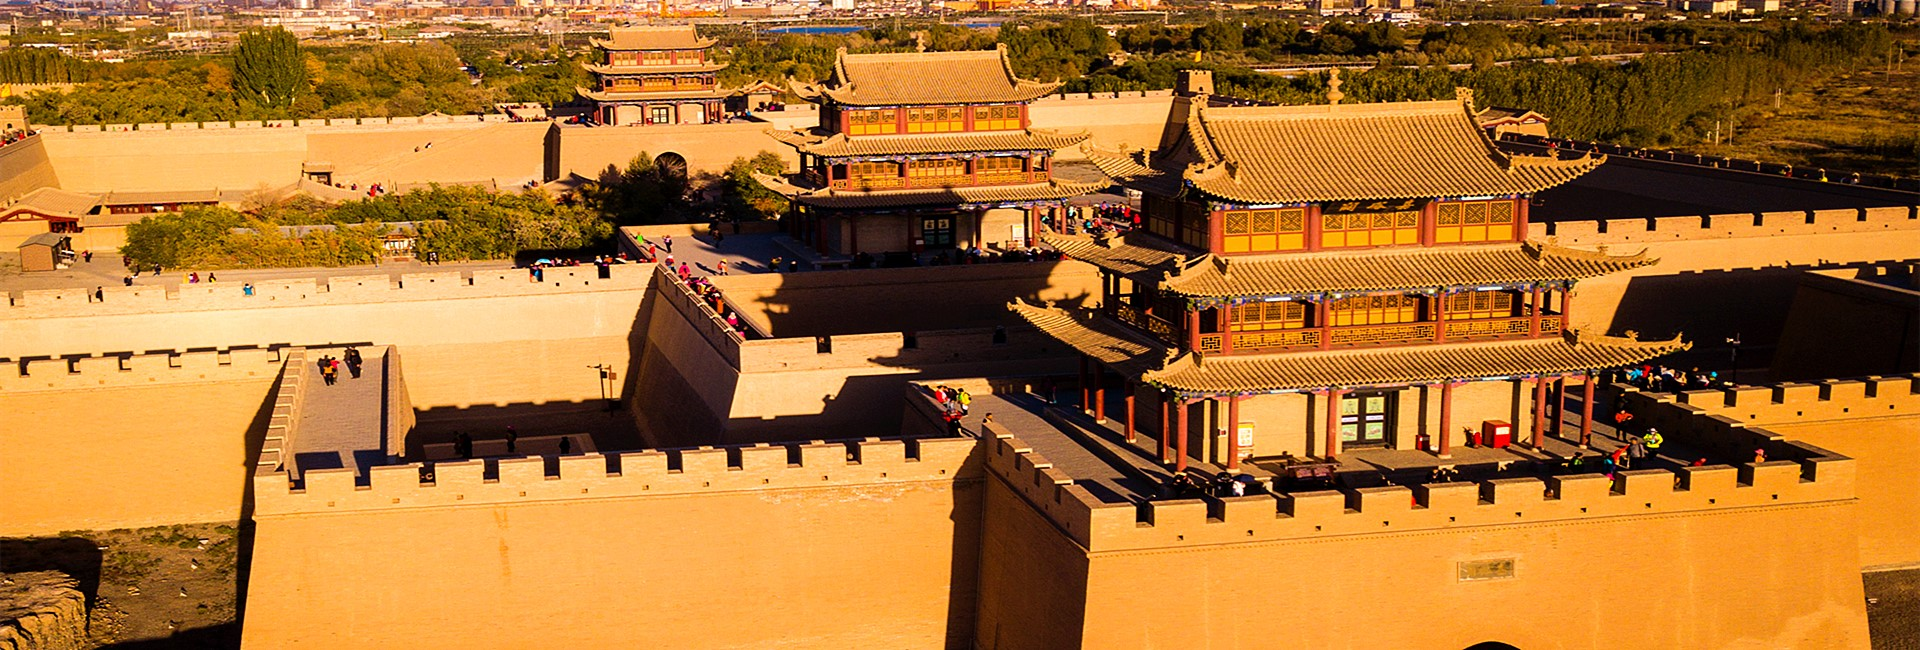 Zhangye Tours